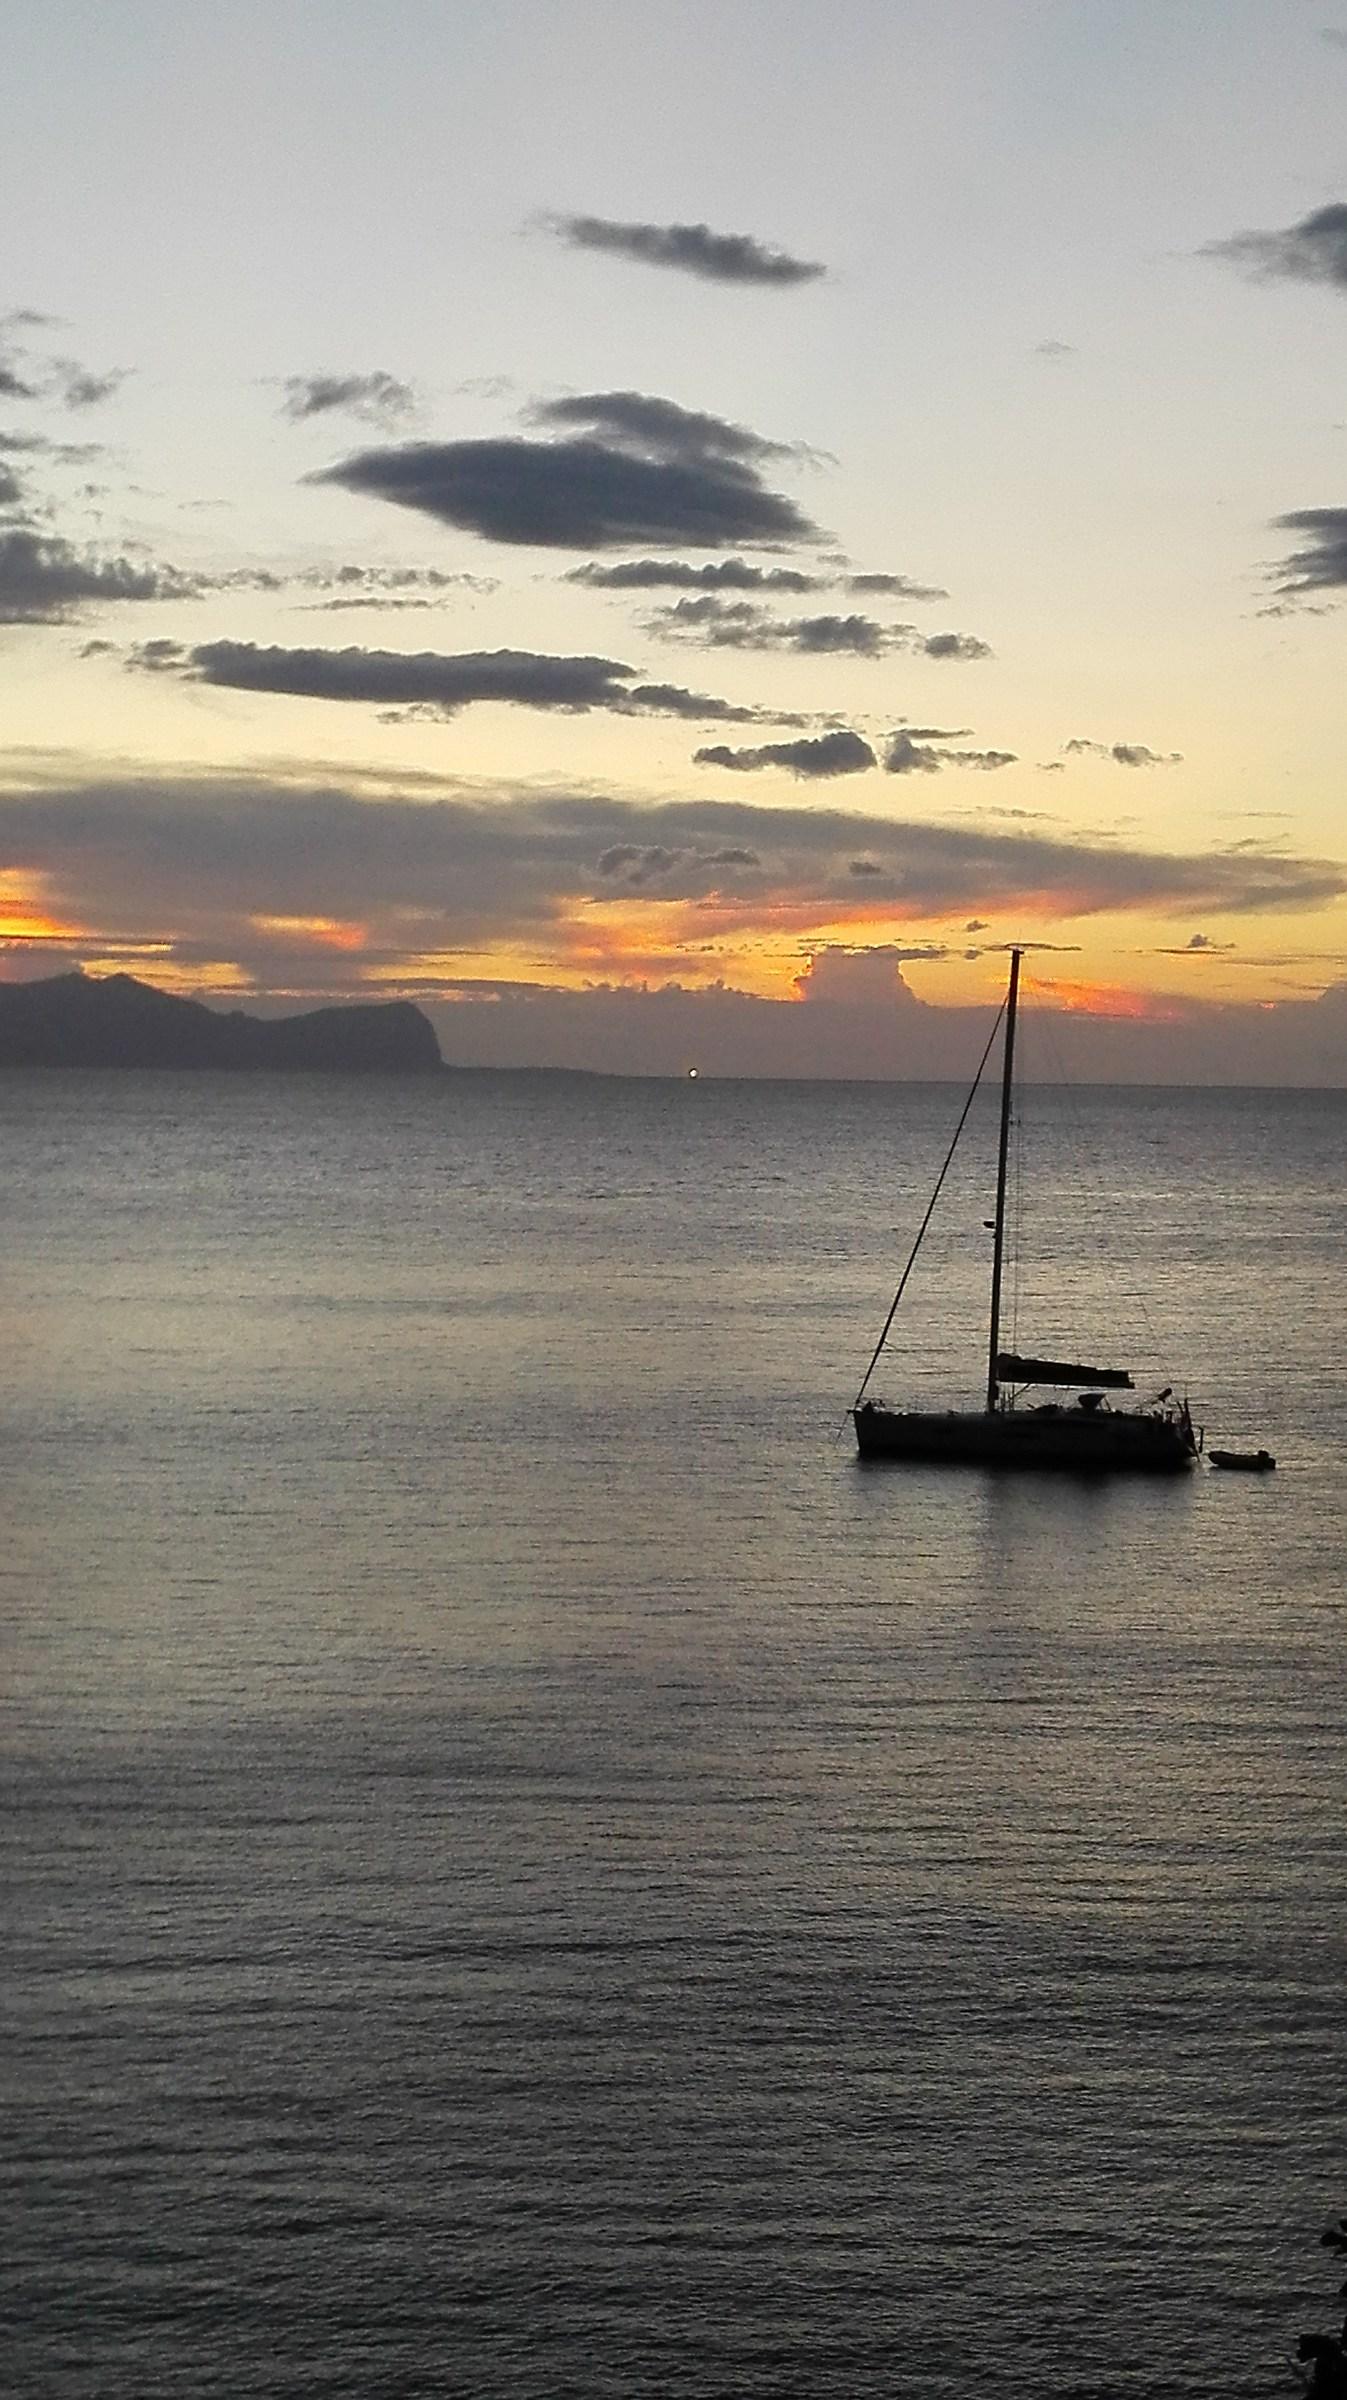 sunset in Sicily...